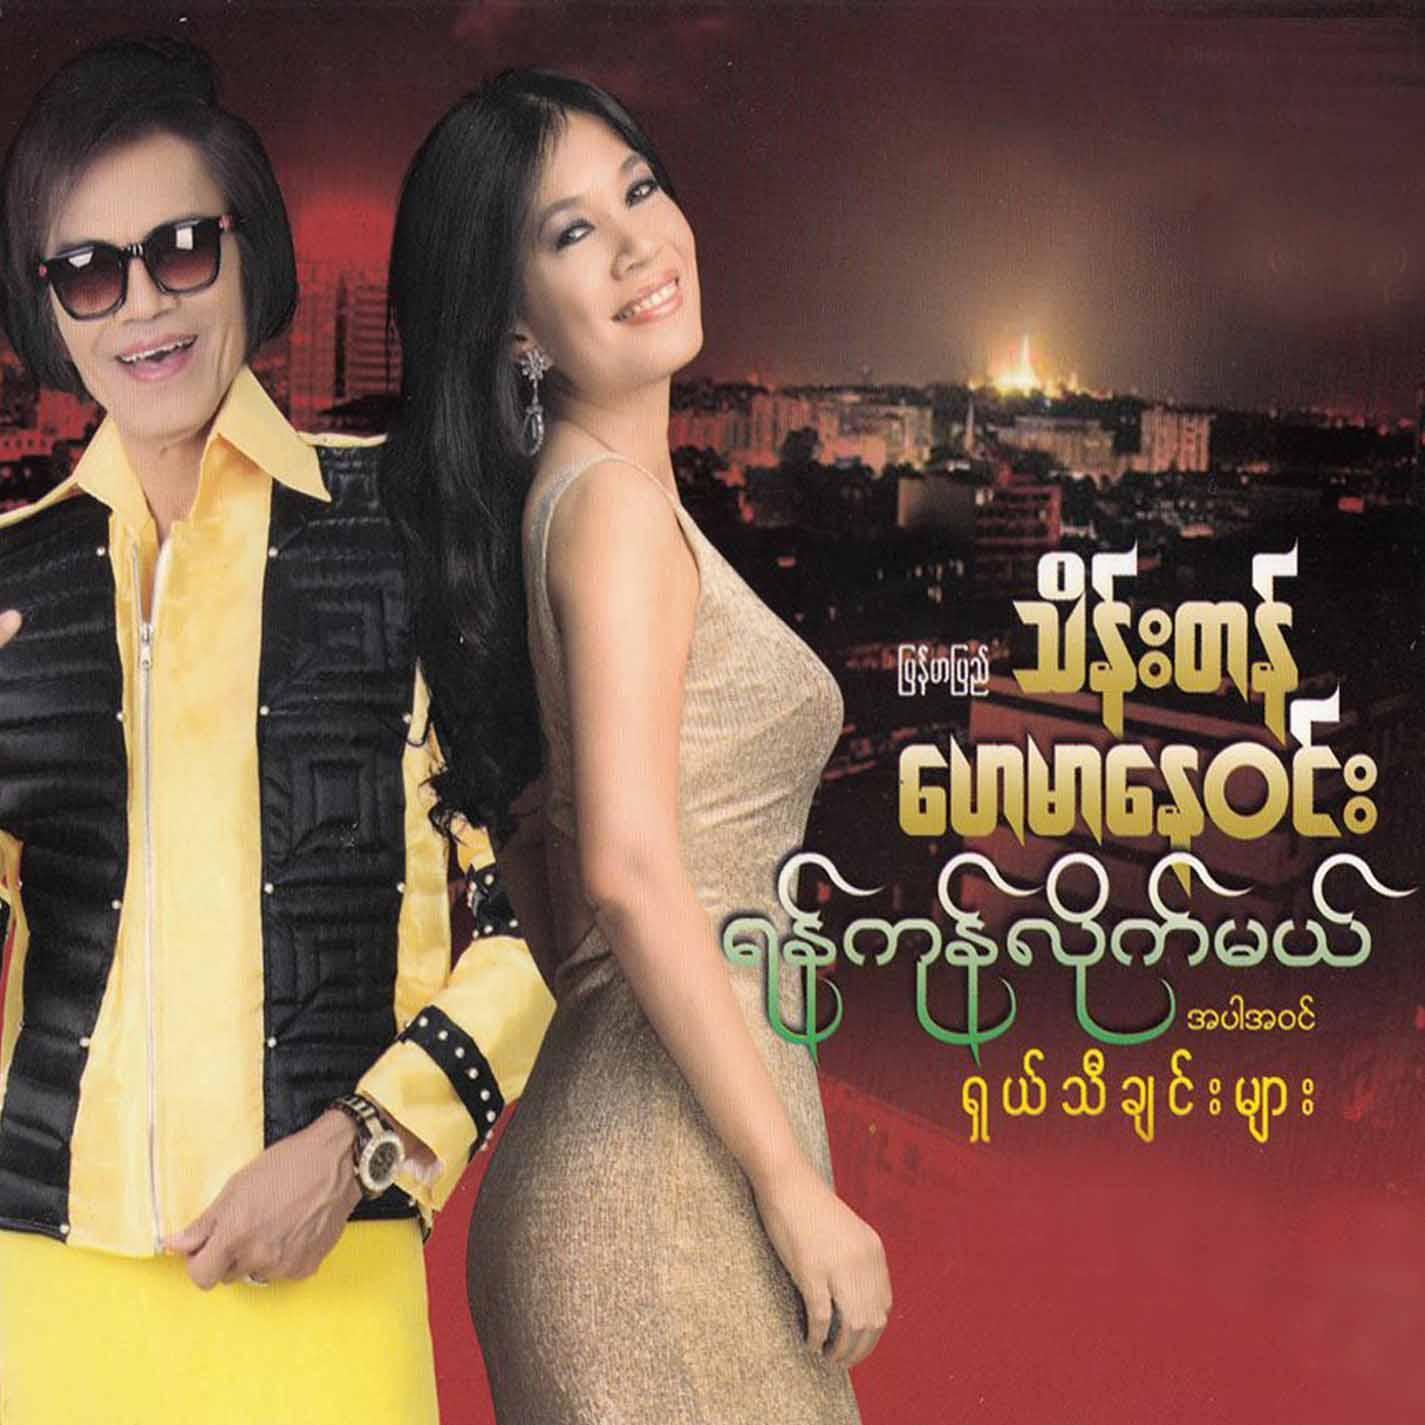 Listen Free To Myanmar Pyi Thein Tan Tu Tu Nyi Nyi Yal Yal Pyone